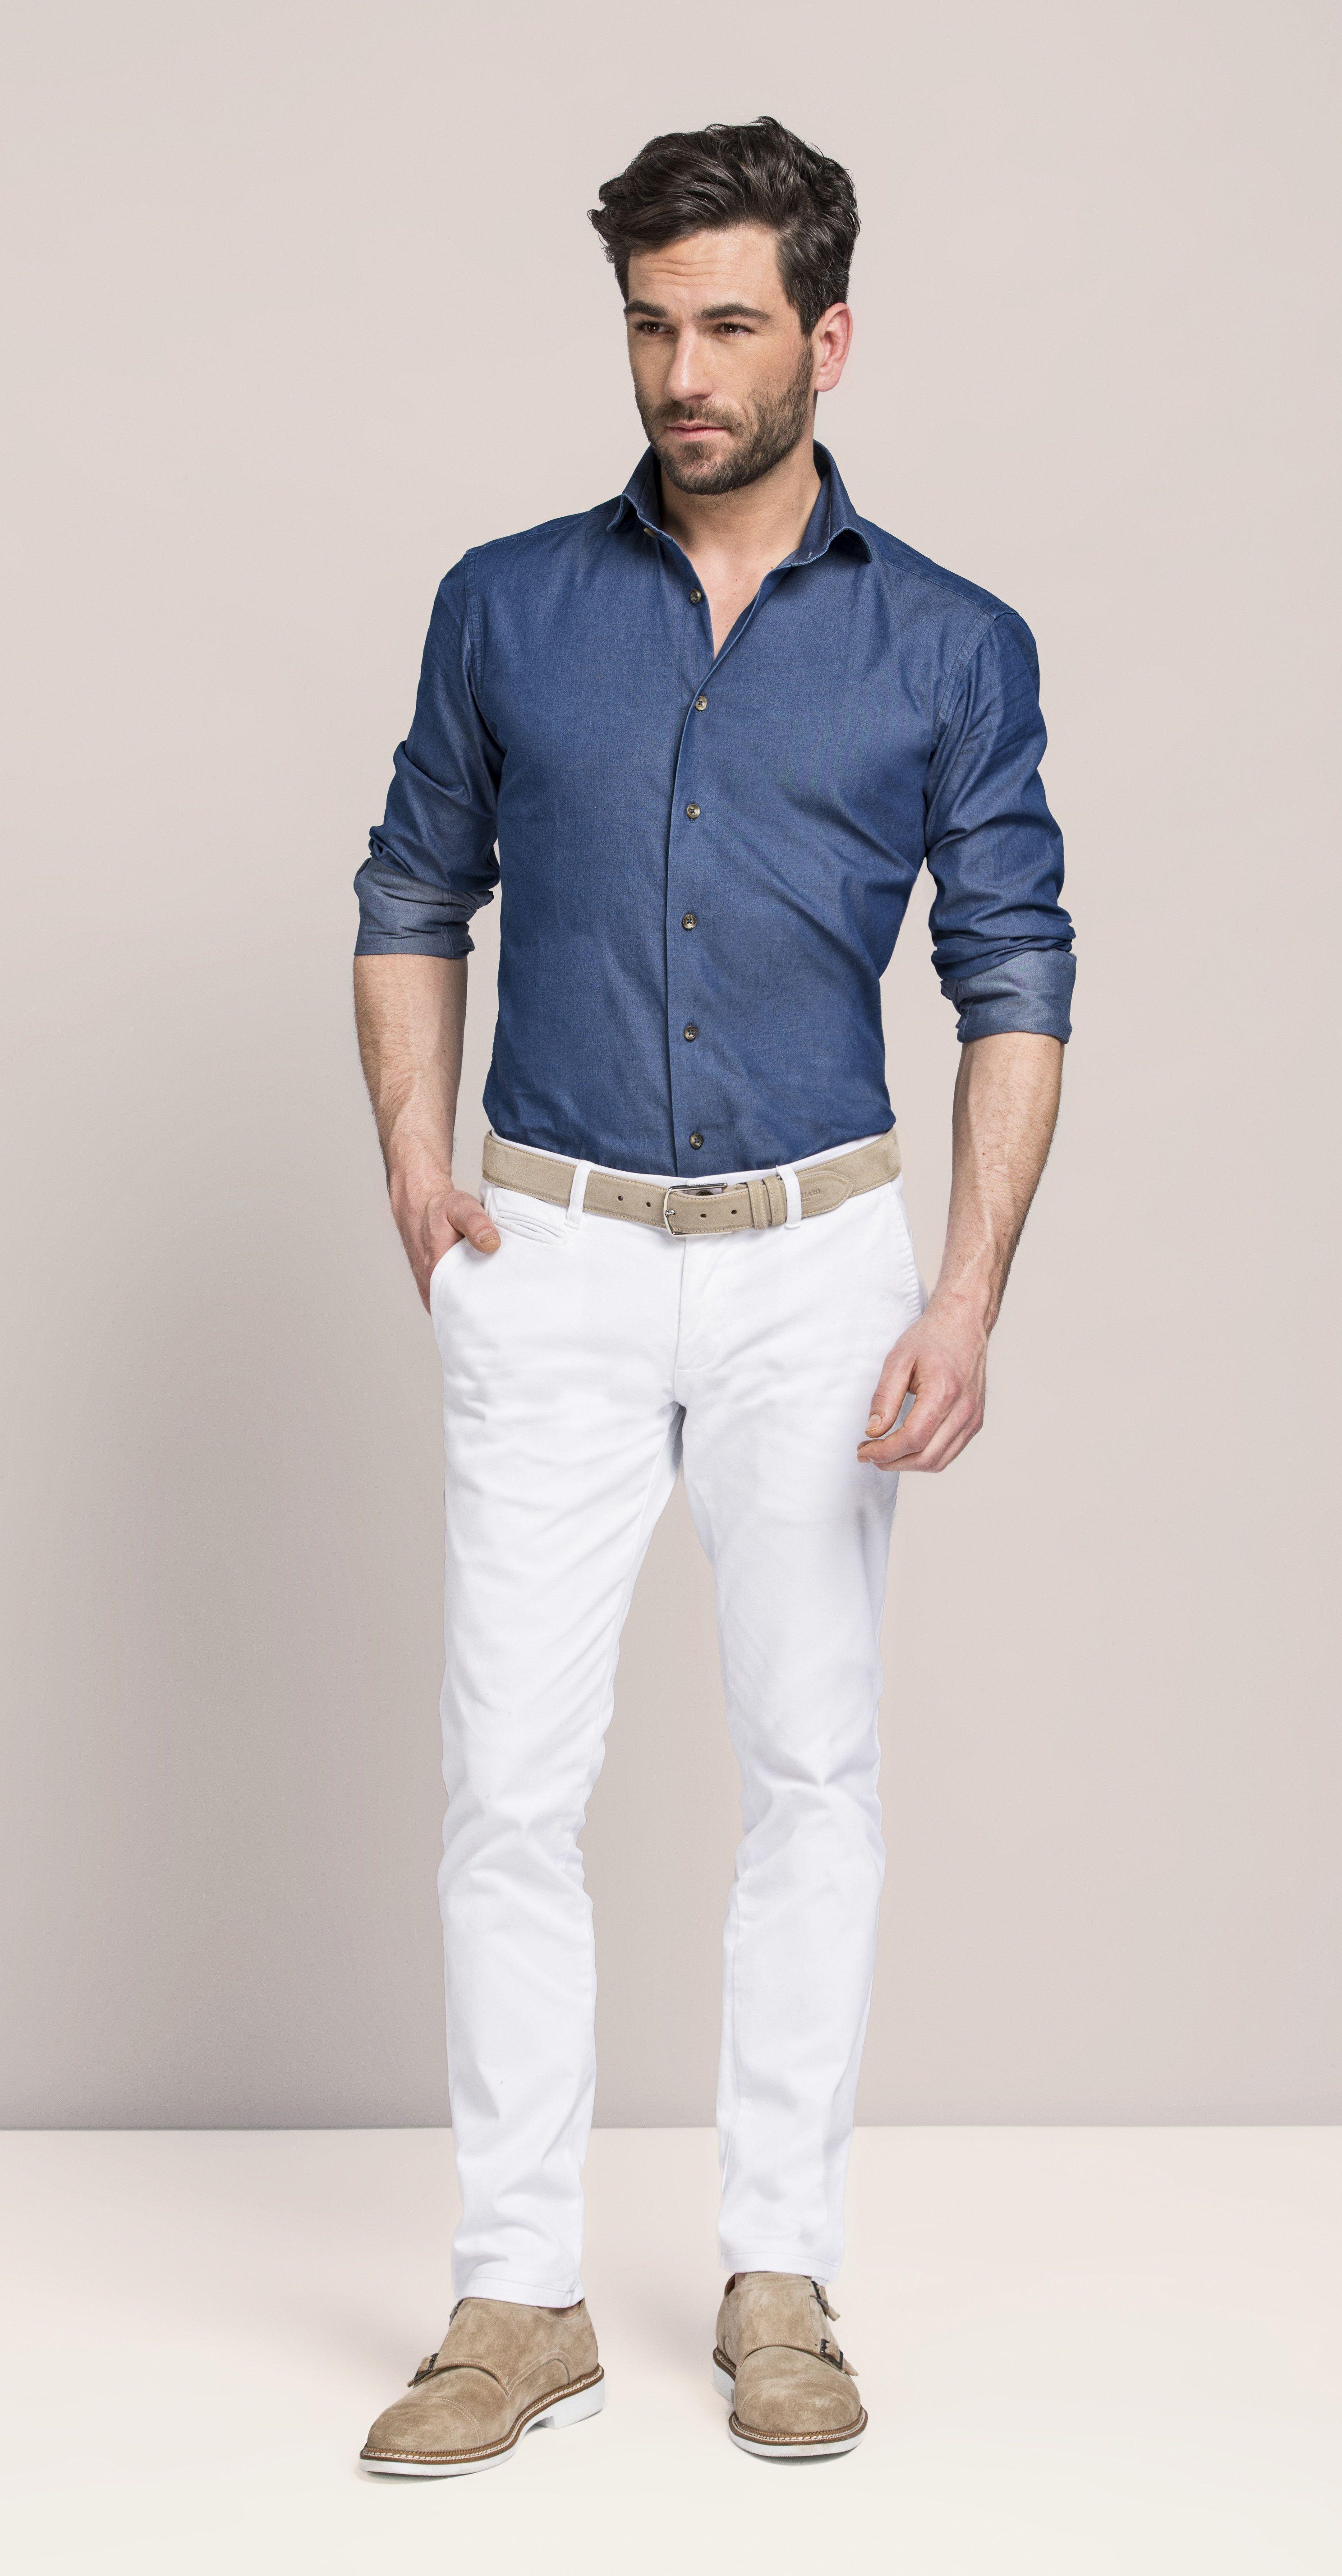 bbf4099a0c Look masculino com camisa social azul